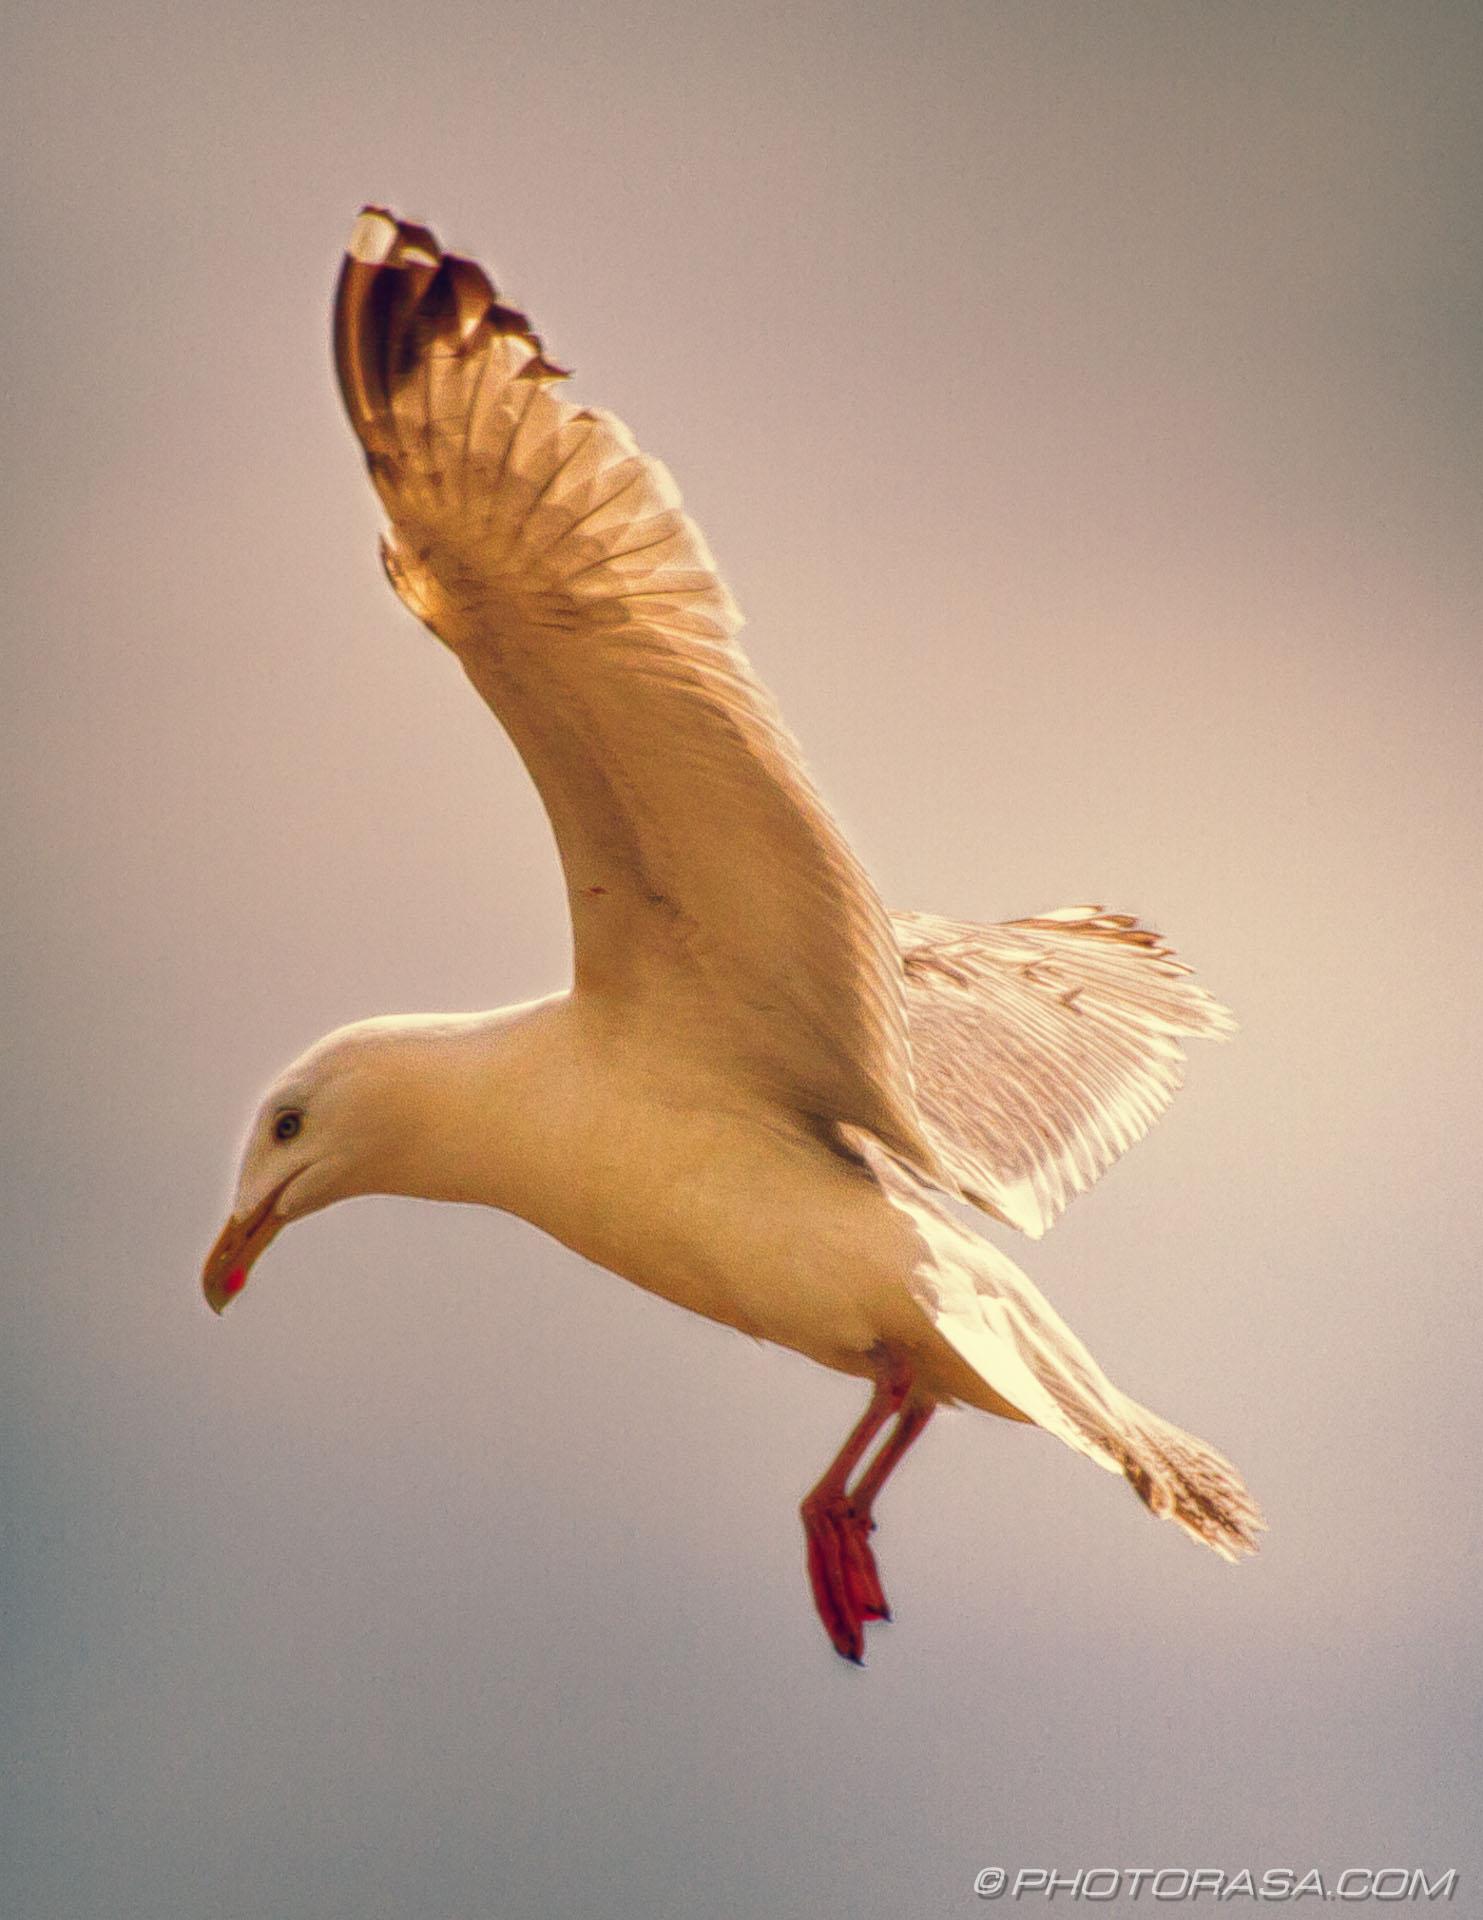 https://photorasa.com/seagulls/seagull-in-flight/